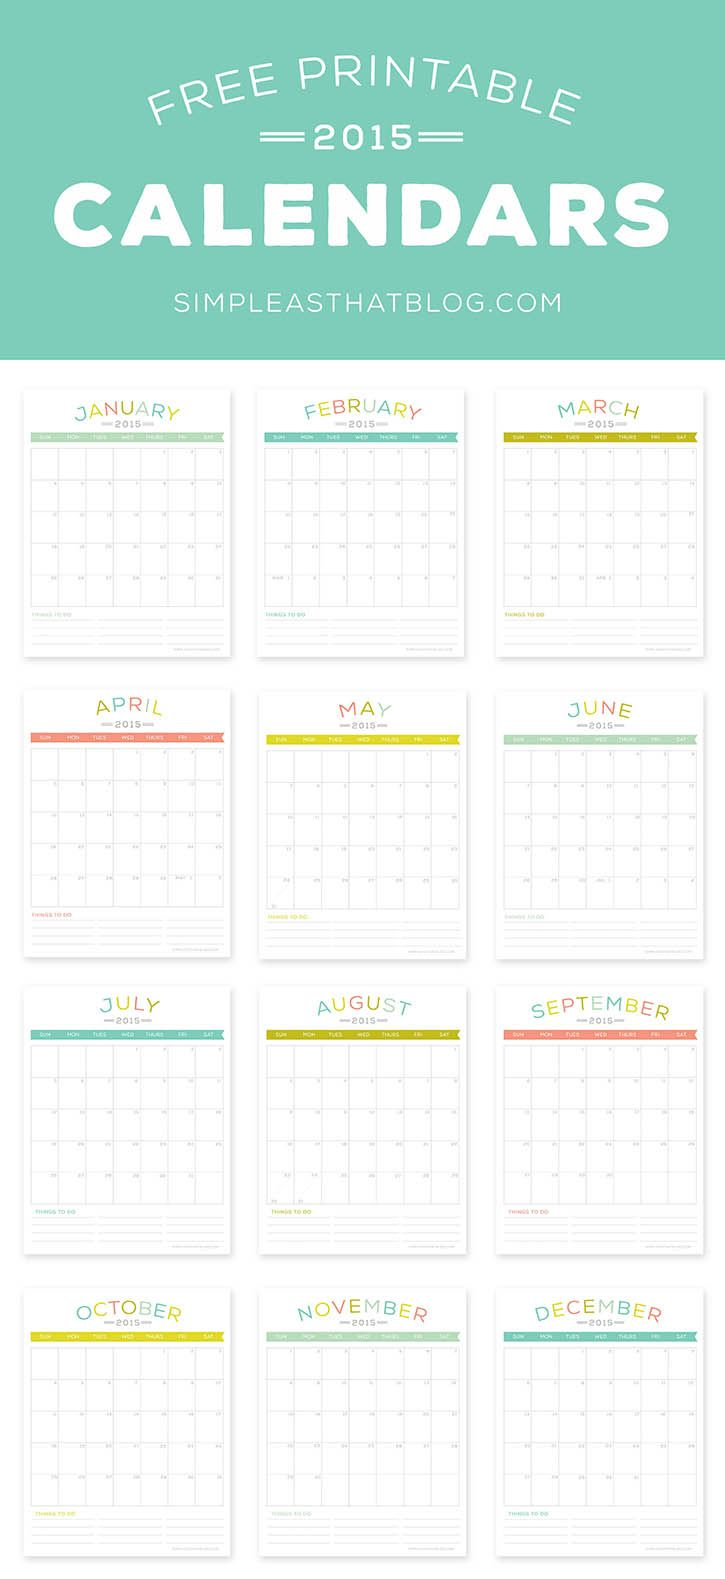 Free printable 2015 Calendars | Simple as That Blog